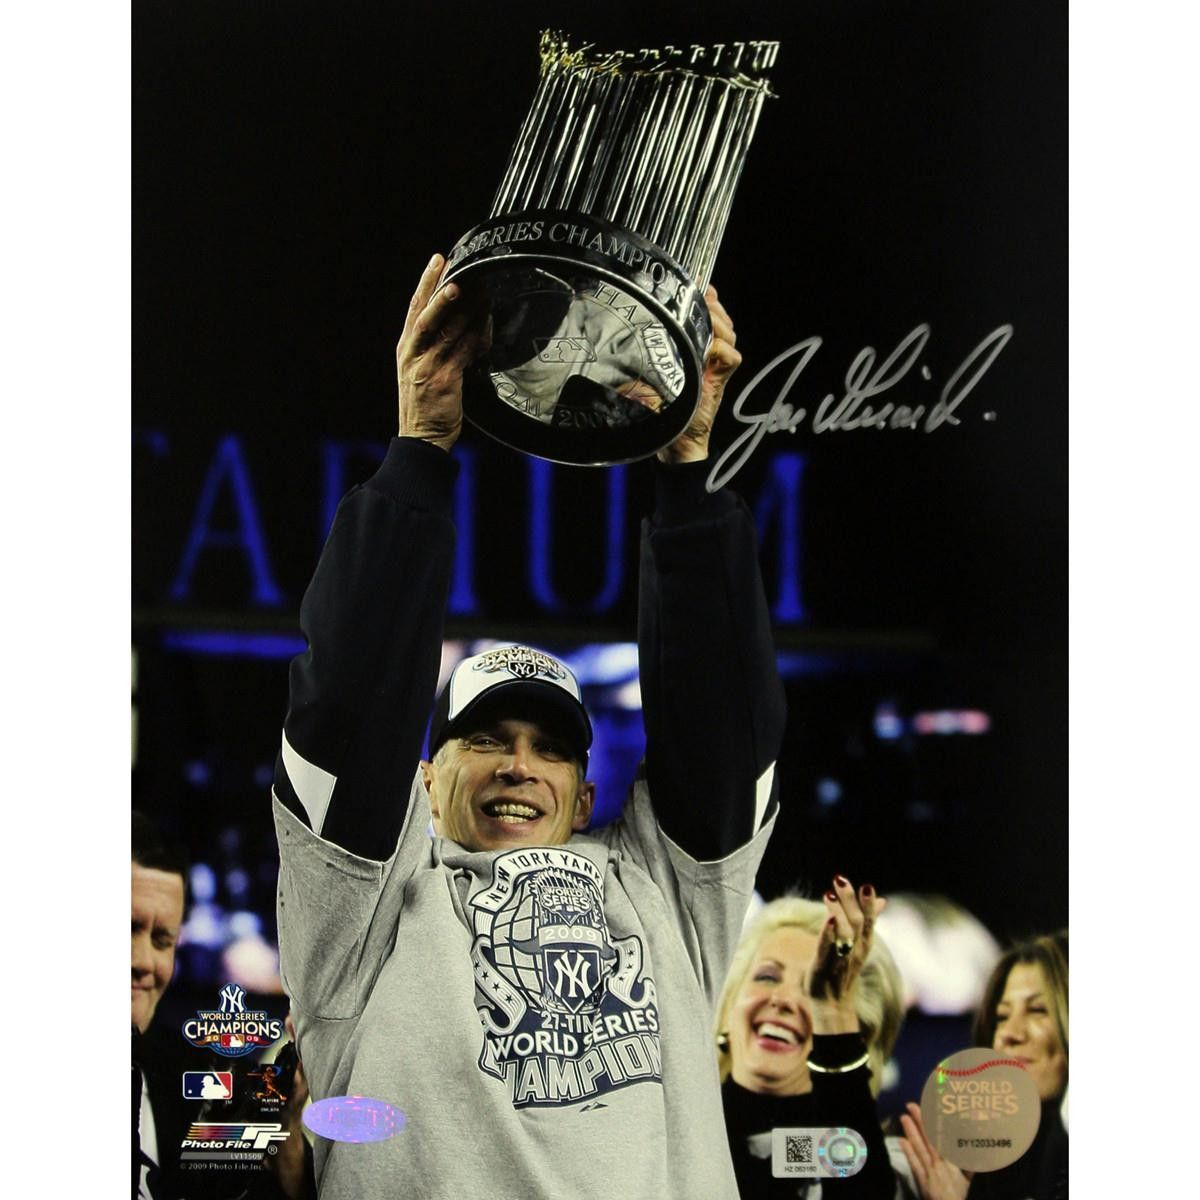 Joe Girardi with 2009 World Series Trophy Vertical 8x10 Photo (MLB Auth)